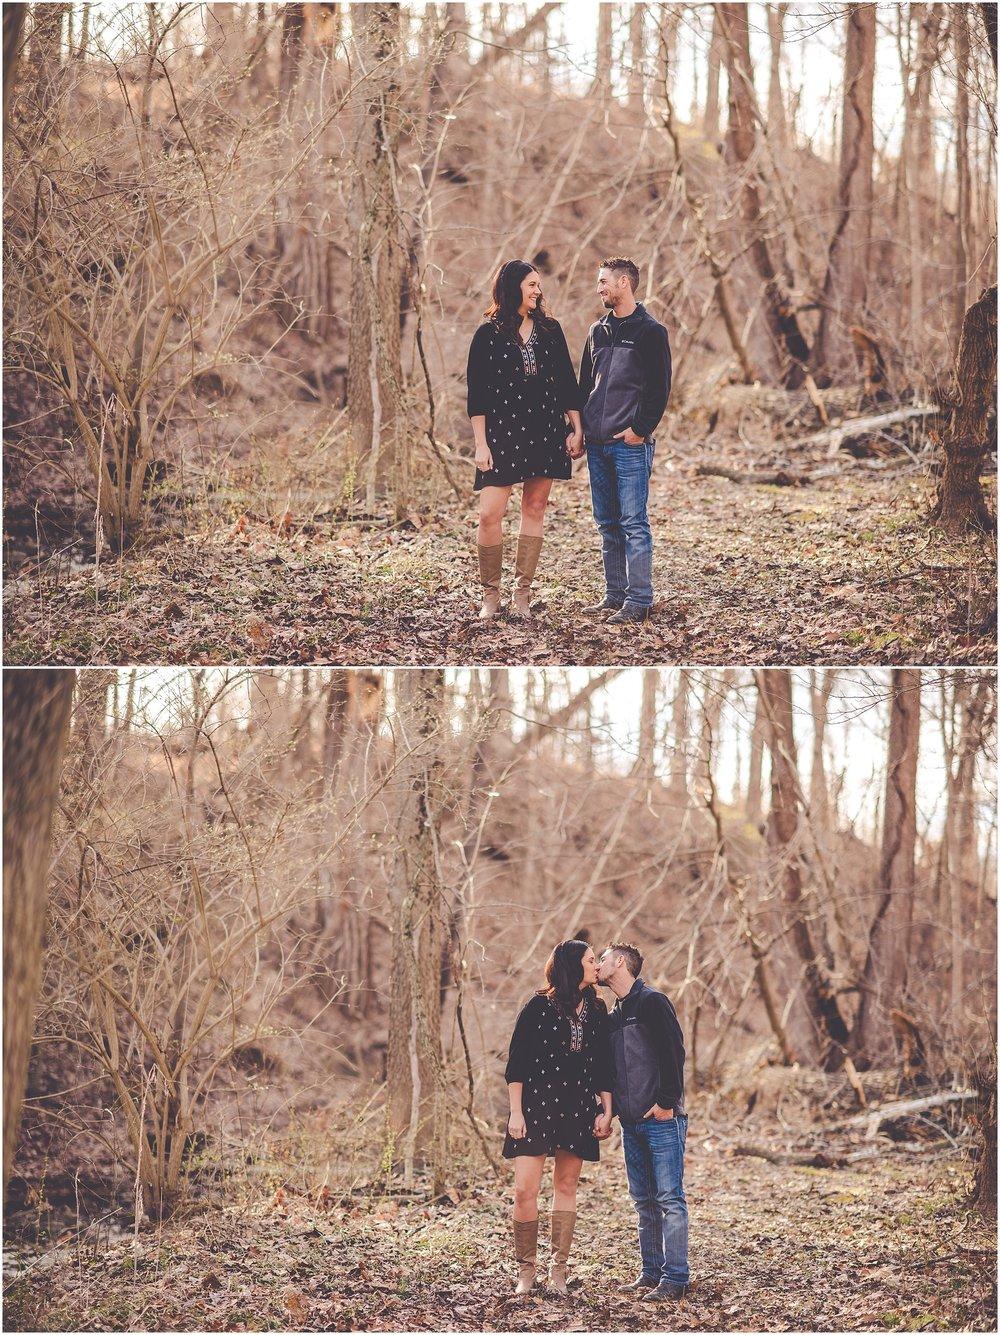 Kara Evans Photographer - Central Illinois Wedding Photographer - March Engagement Session - Streator Illinois Photographer - Spring Lake Nature Park Photos